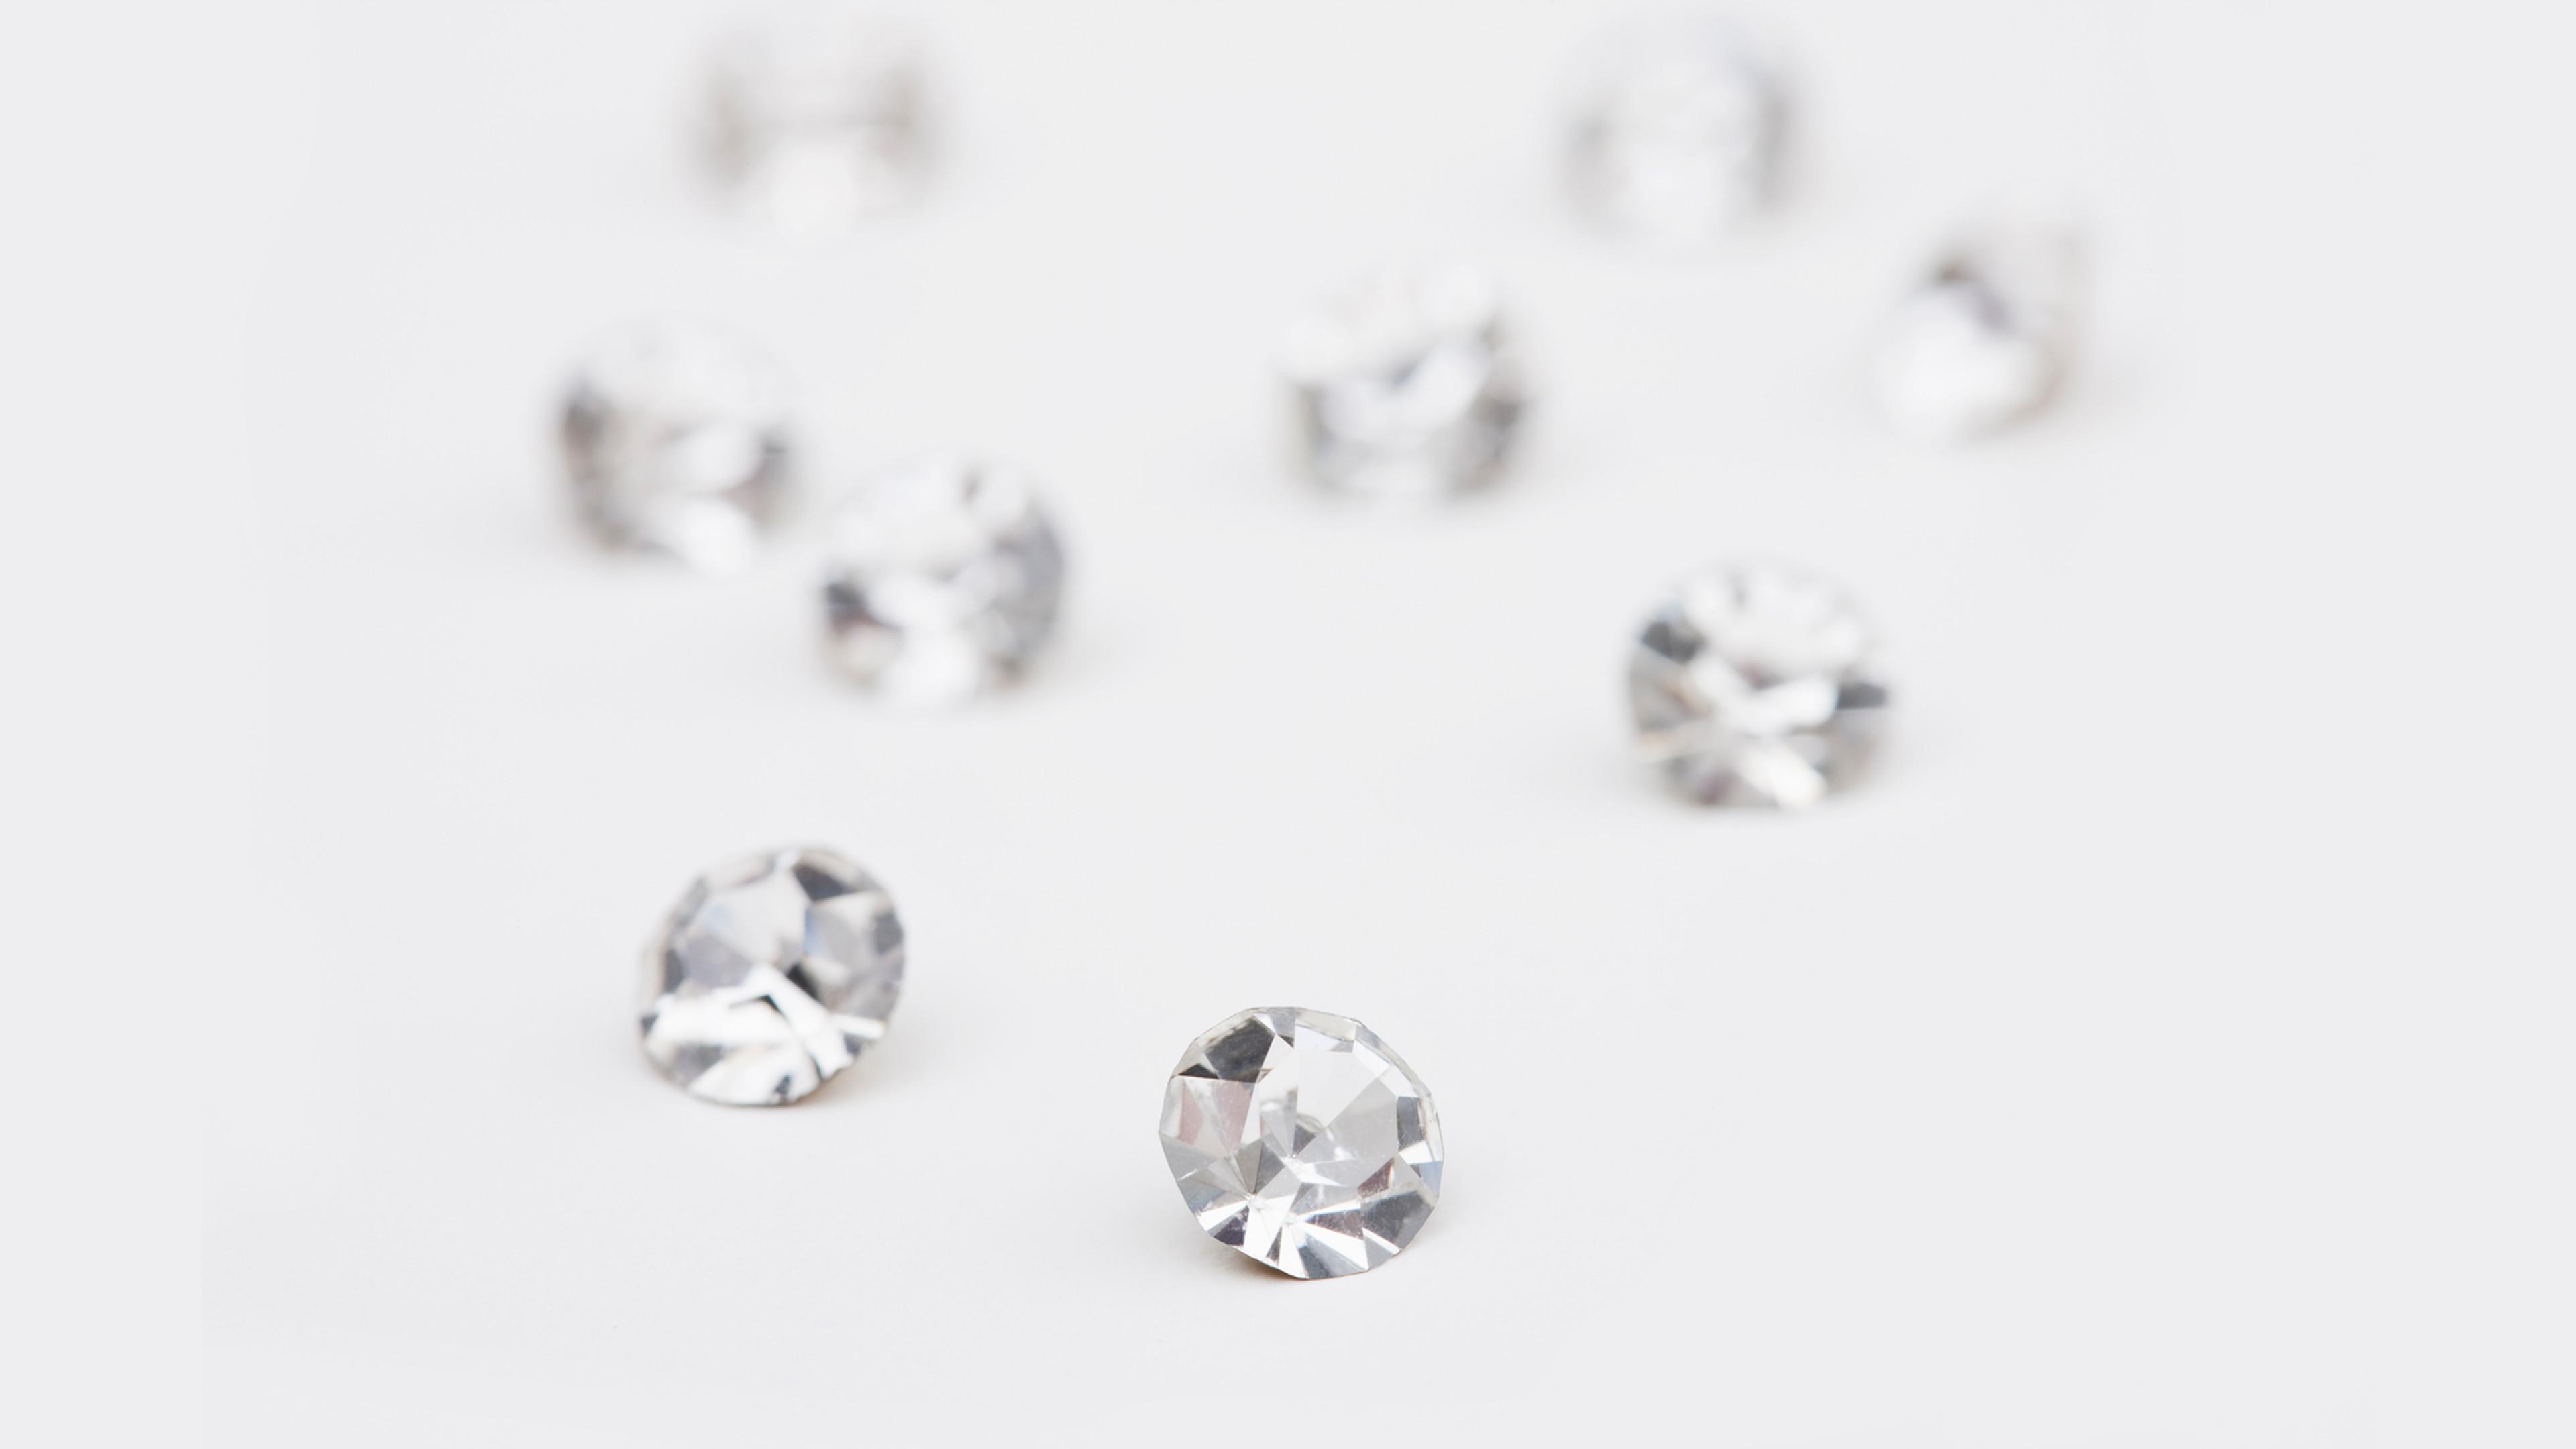 Diamond Grading and Certification